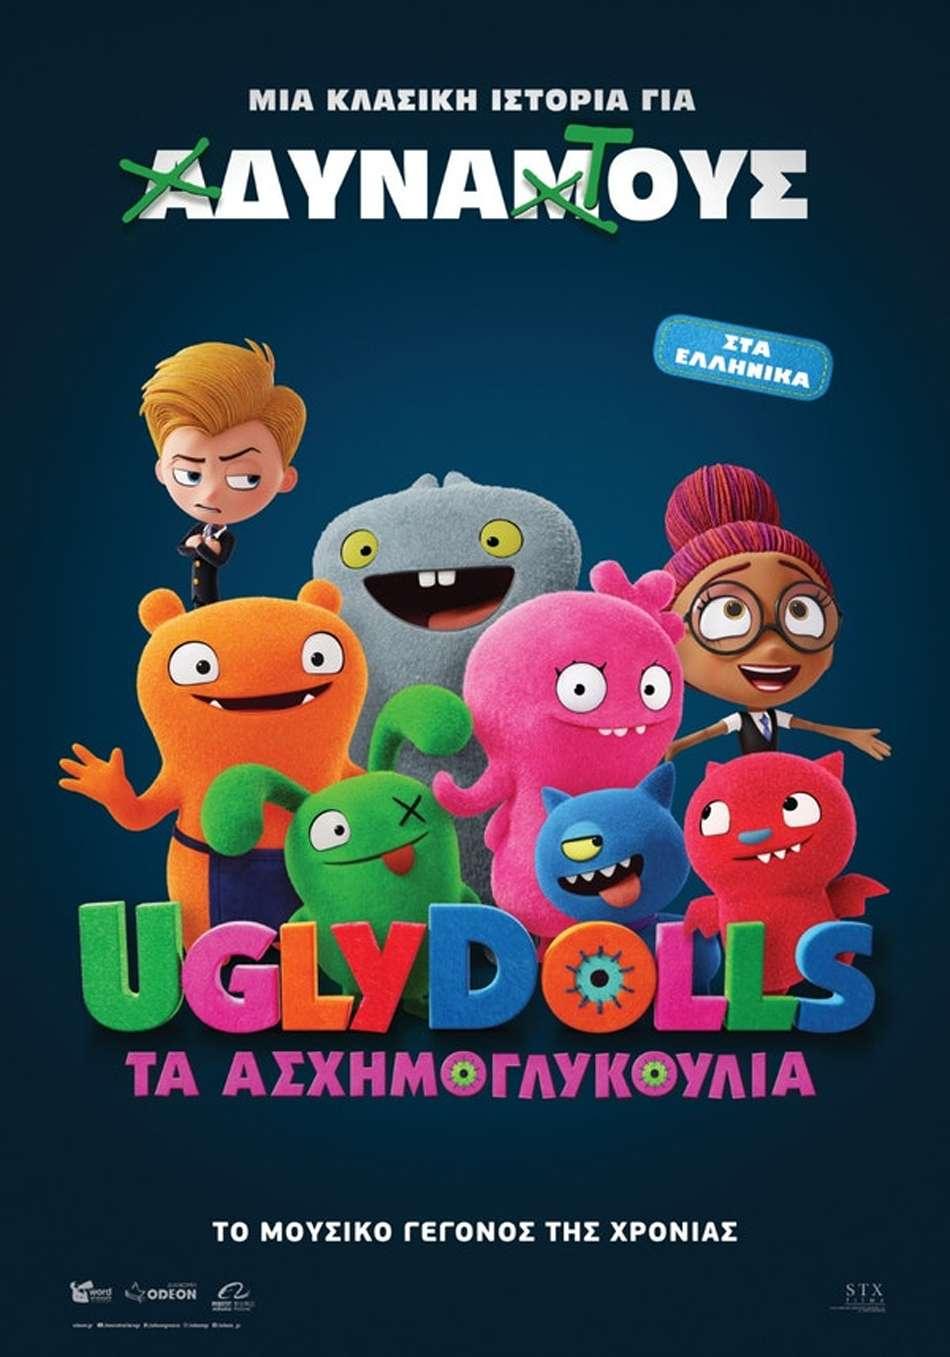 UglyDolls: Τα Ασχημογλυκούλια (UglyDolls) - Trailer / Τρέιλερ Poster